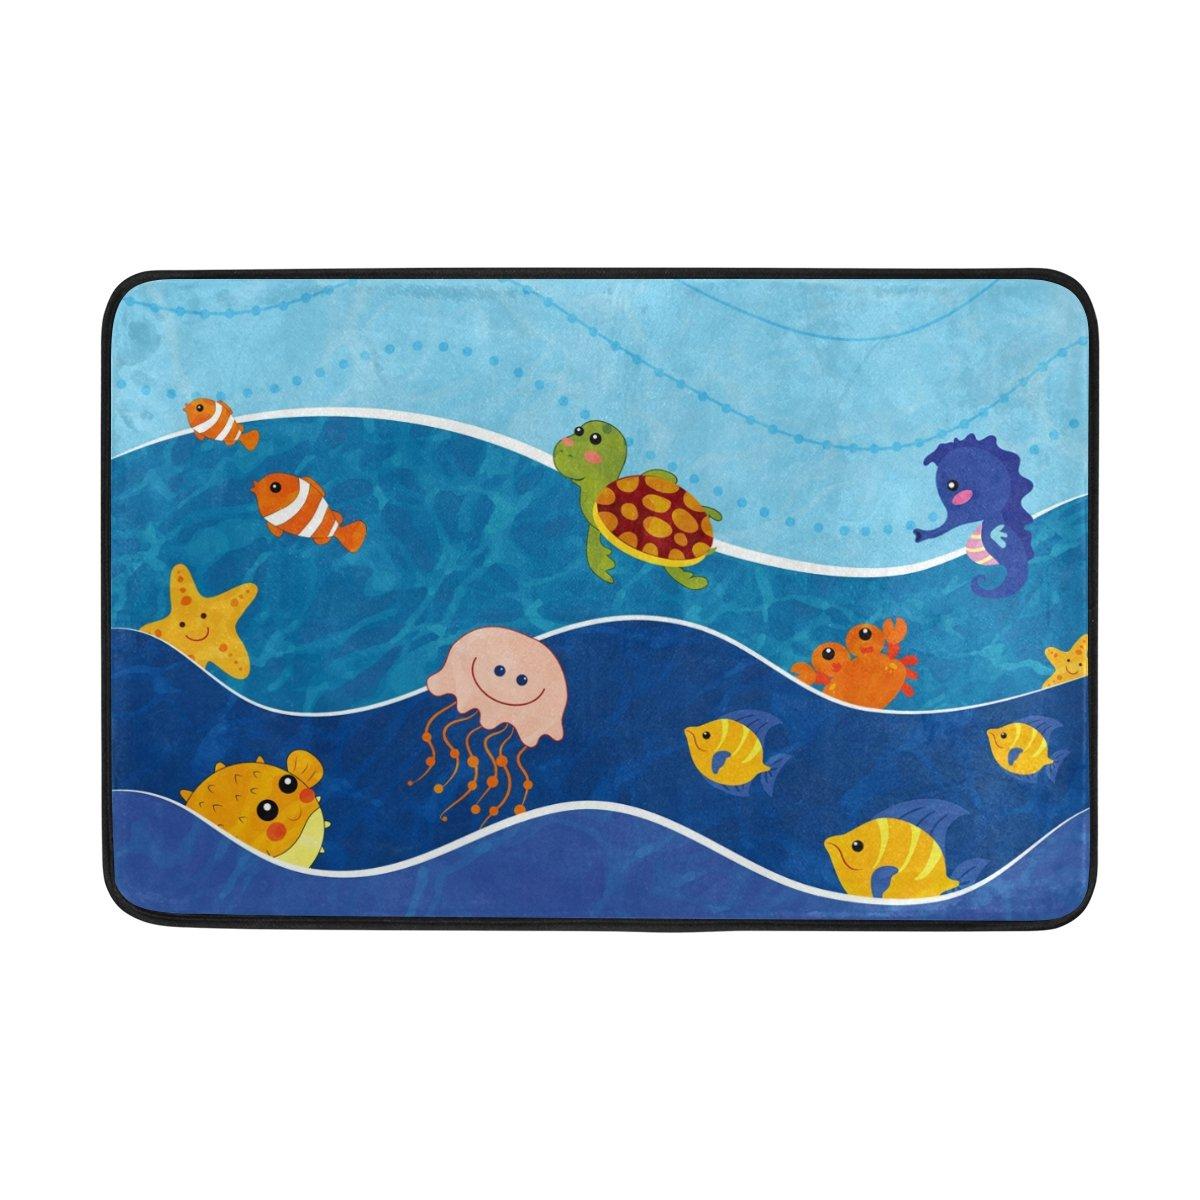 My Daily Sea Animals Cartoon Kids Doormat 15.7 x 23.6, Living Room Bedroom Kitchen Bathroom Decorative Unique Lightweight Printed Rugs Carpet